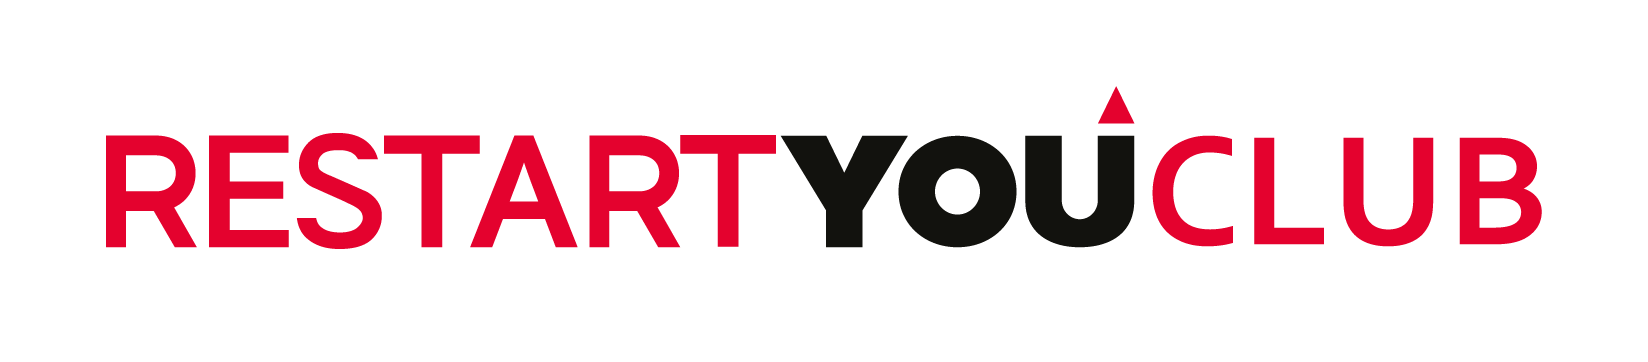 RestartYOU CLUB